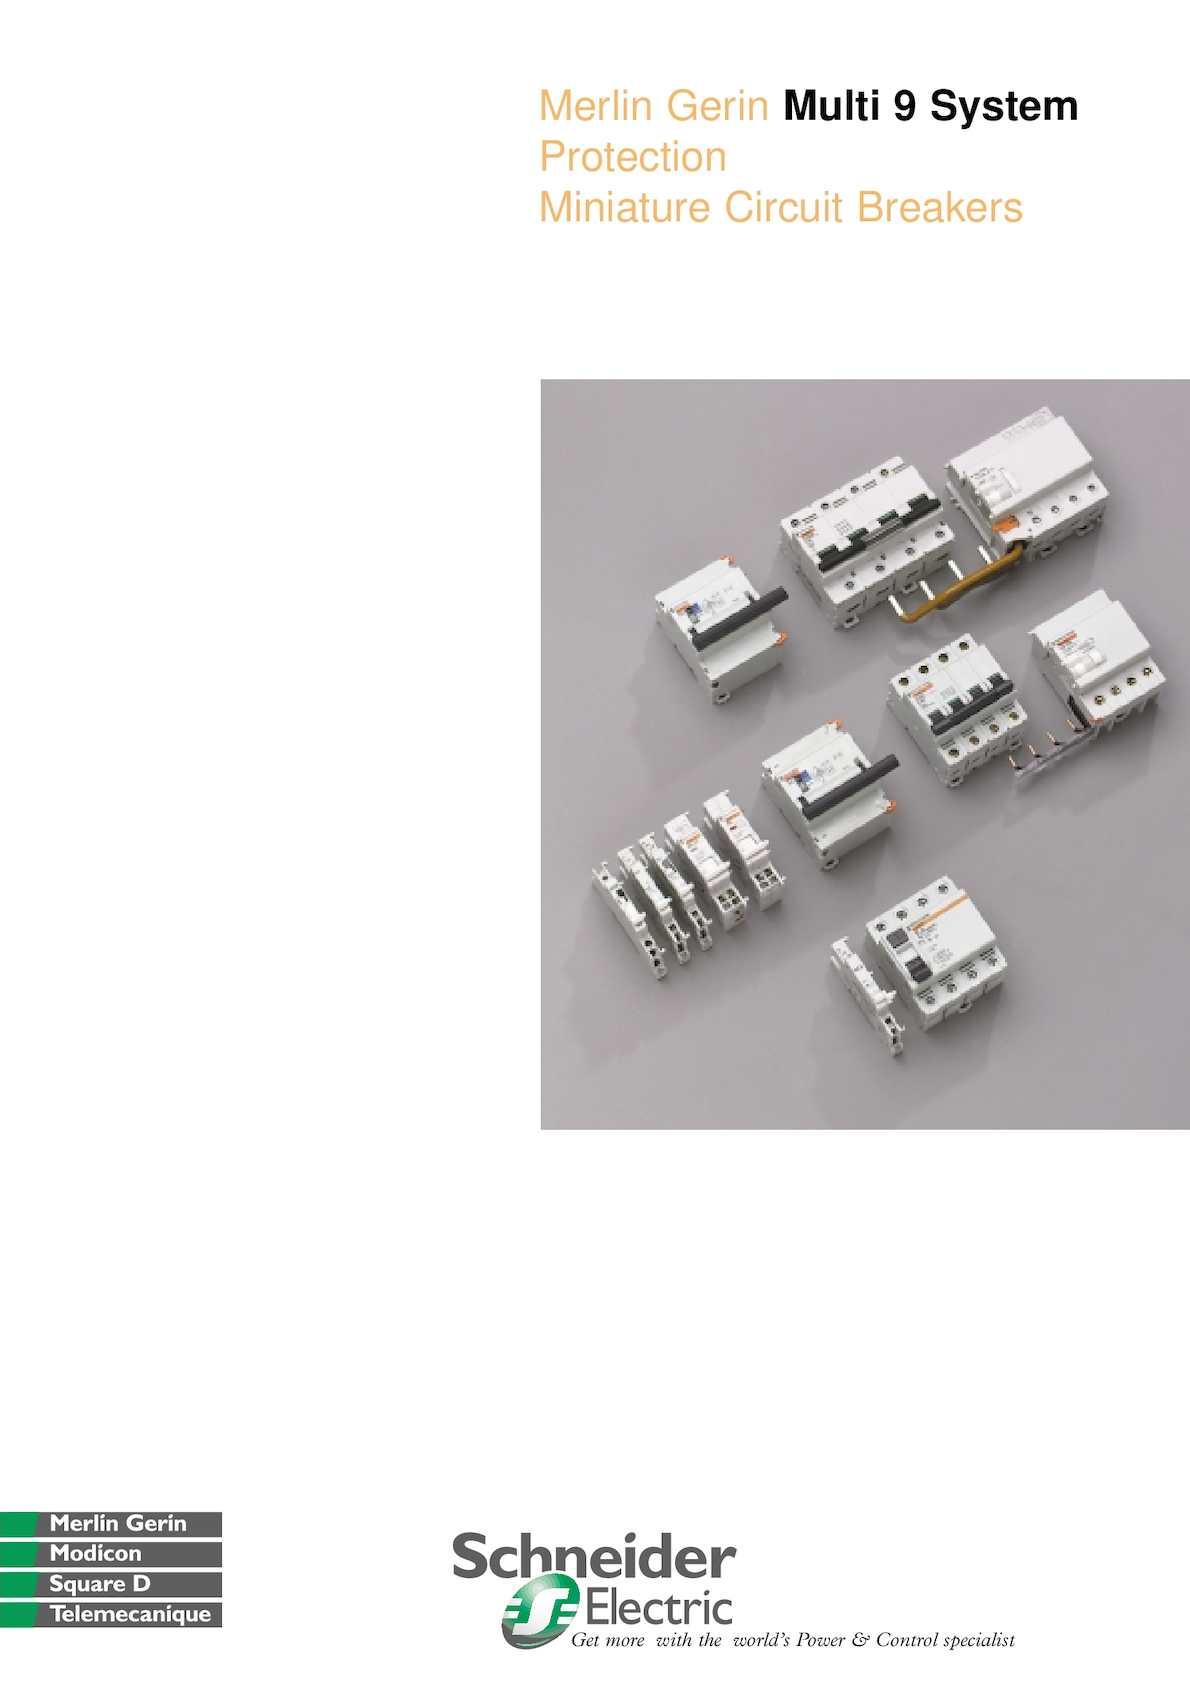 Calamo Interruptor Multi9 6a 2p C Merlin Gerin Modelo C60n Replacement Parts Lift Circuit Breakers Time Delay Breaker